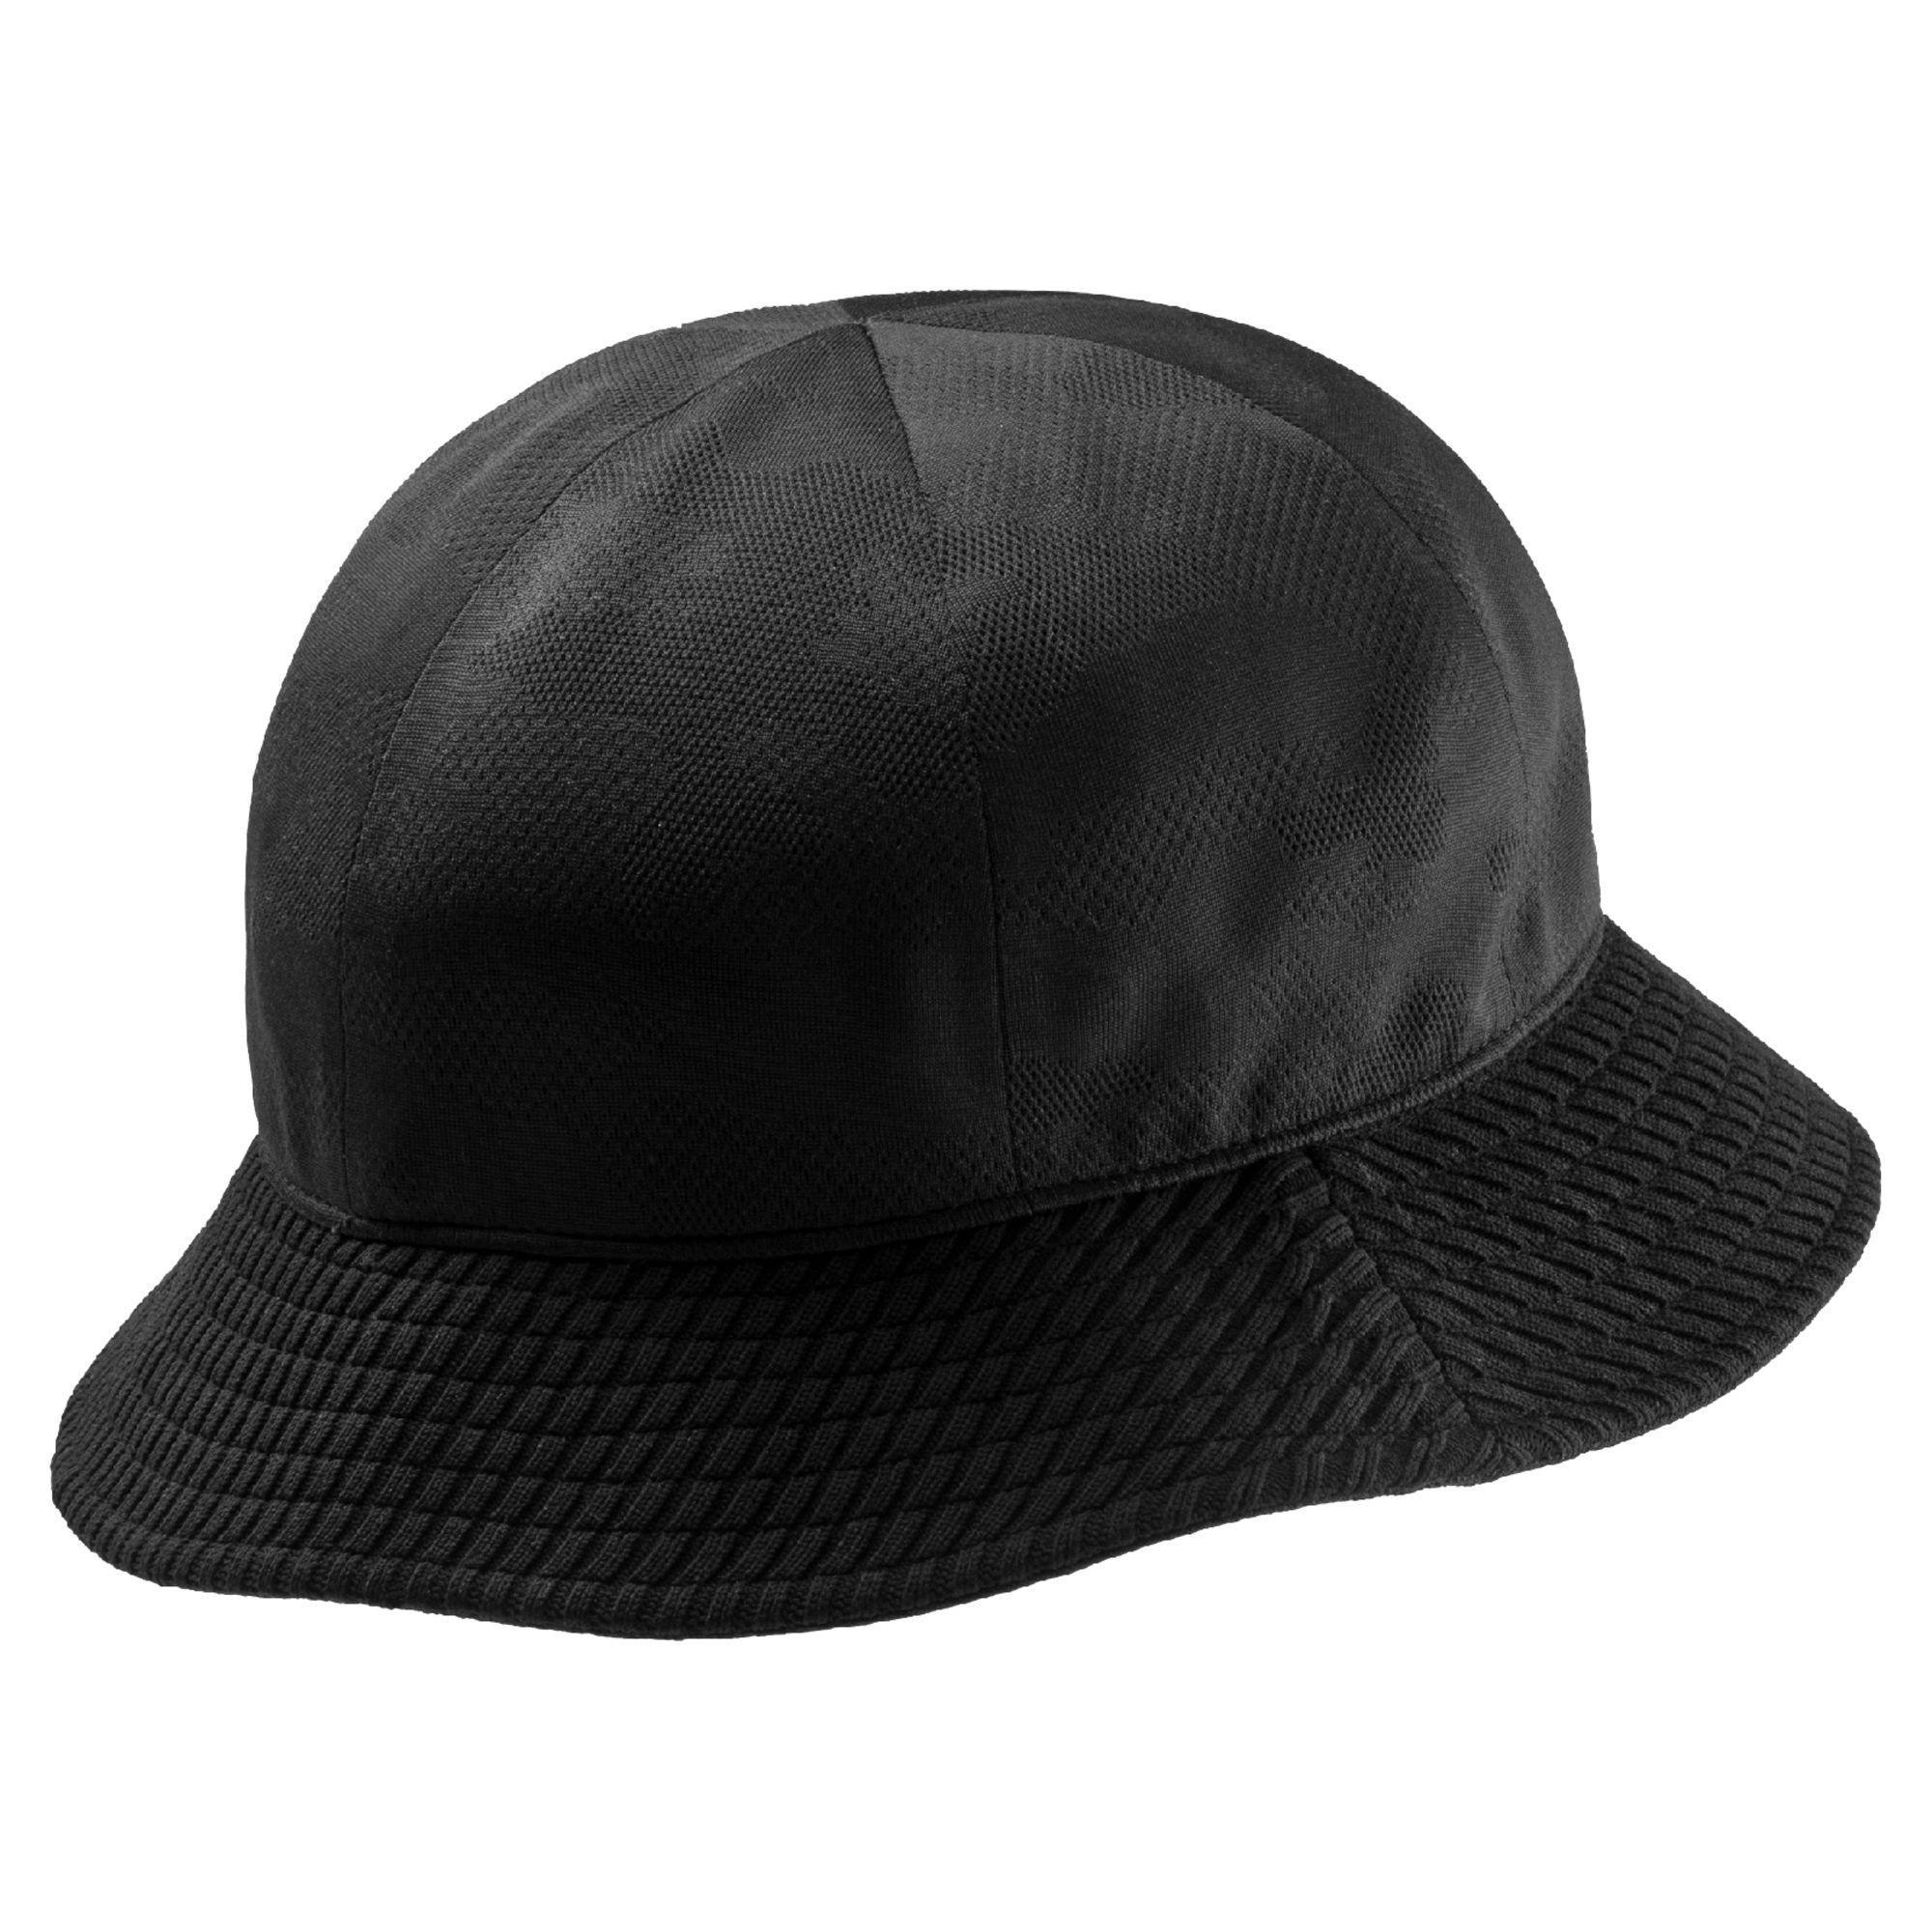 Lyst - PUMA X Naturel Bucket Hat in Black for Men 92733da17925